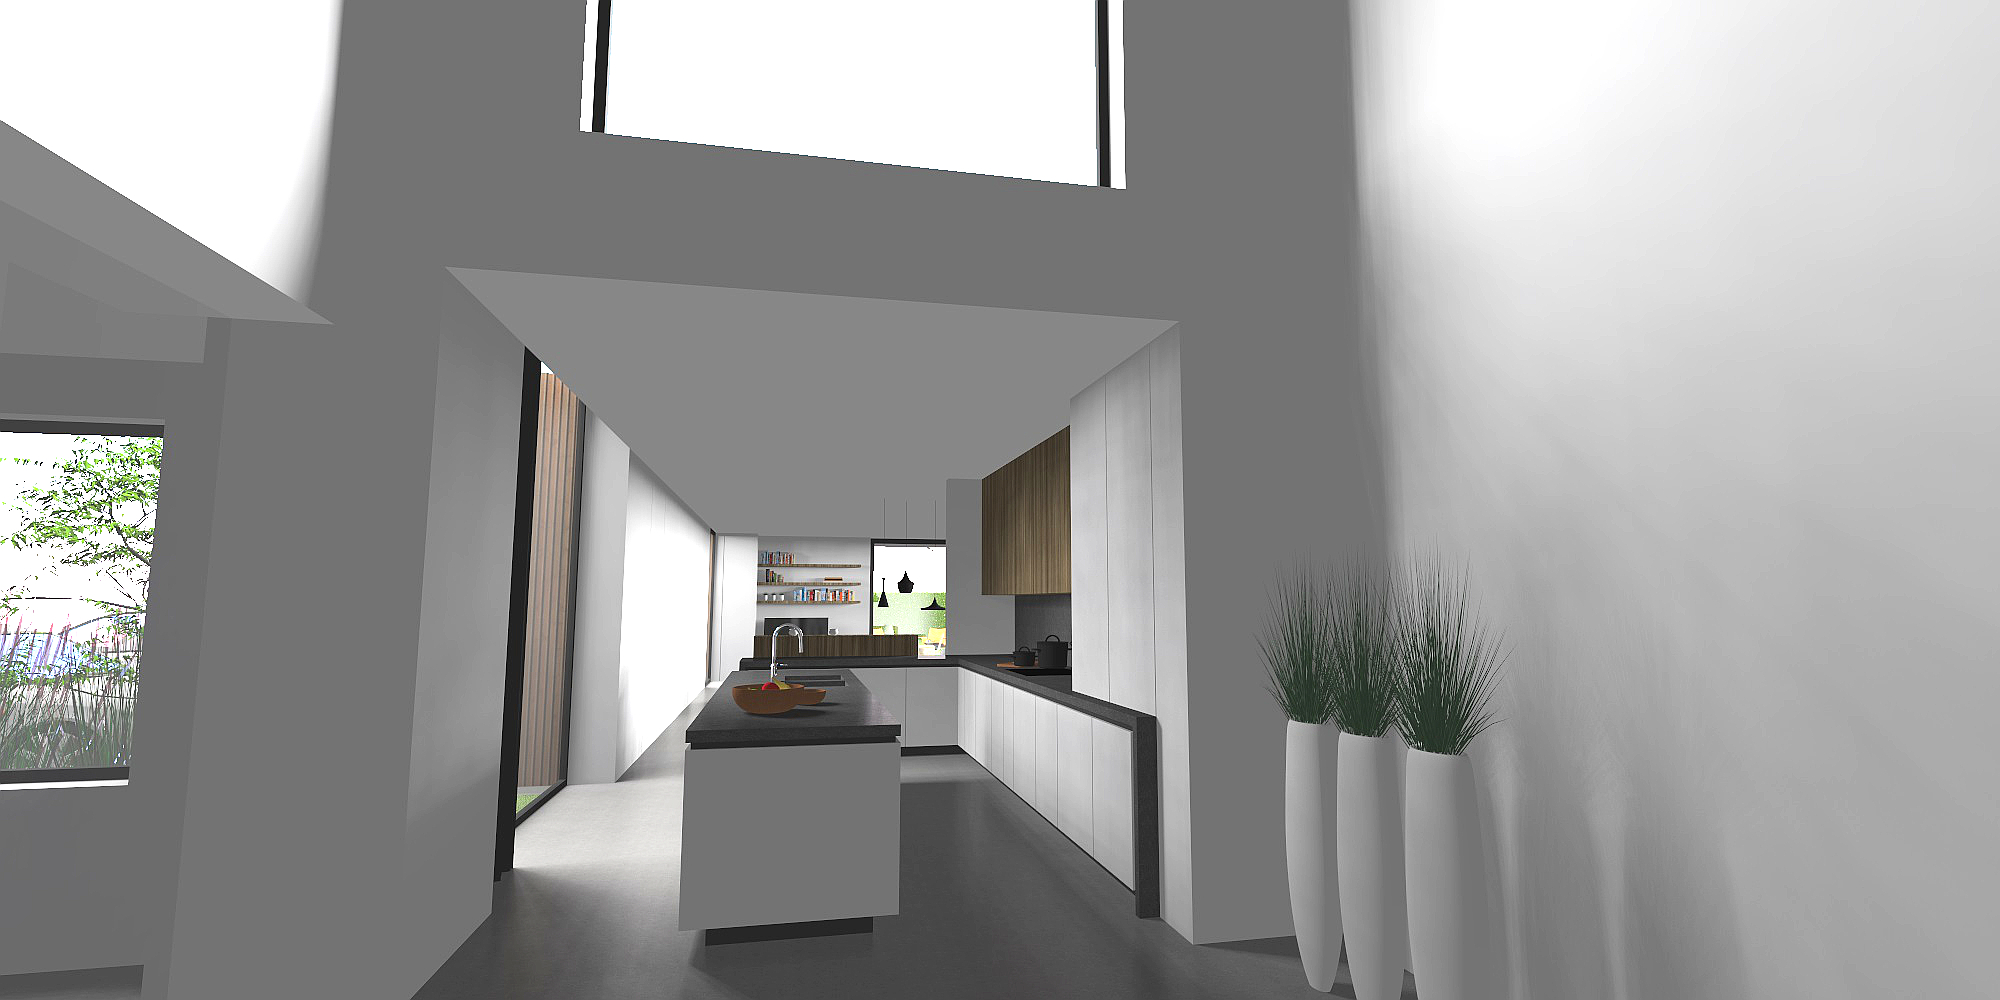 14_011_VM_VANWONTERGHEM OT 3D 02 interieur 03.jpg